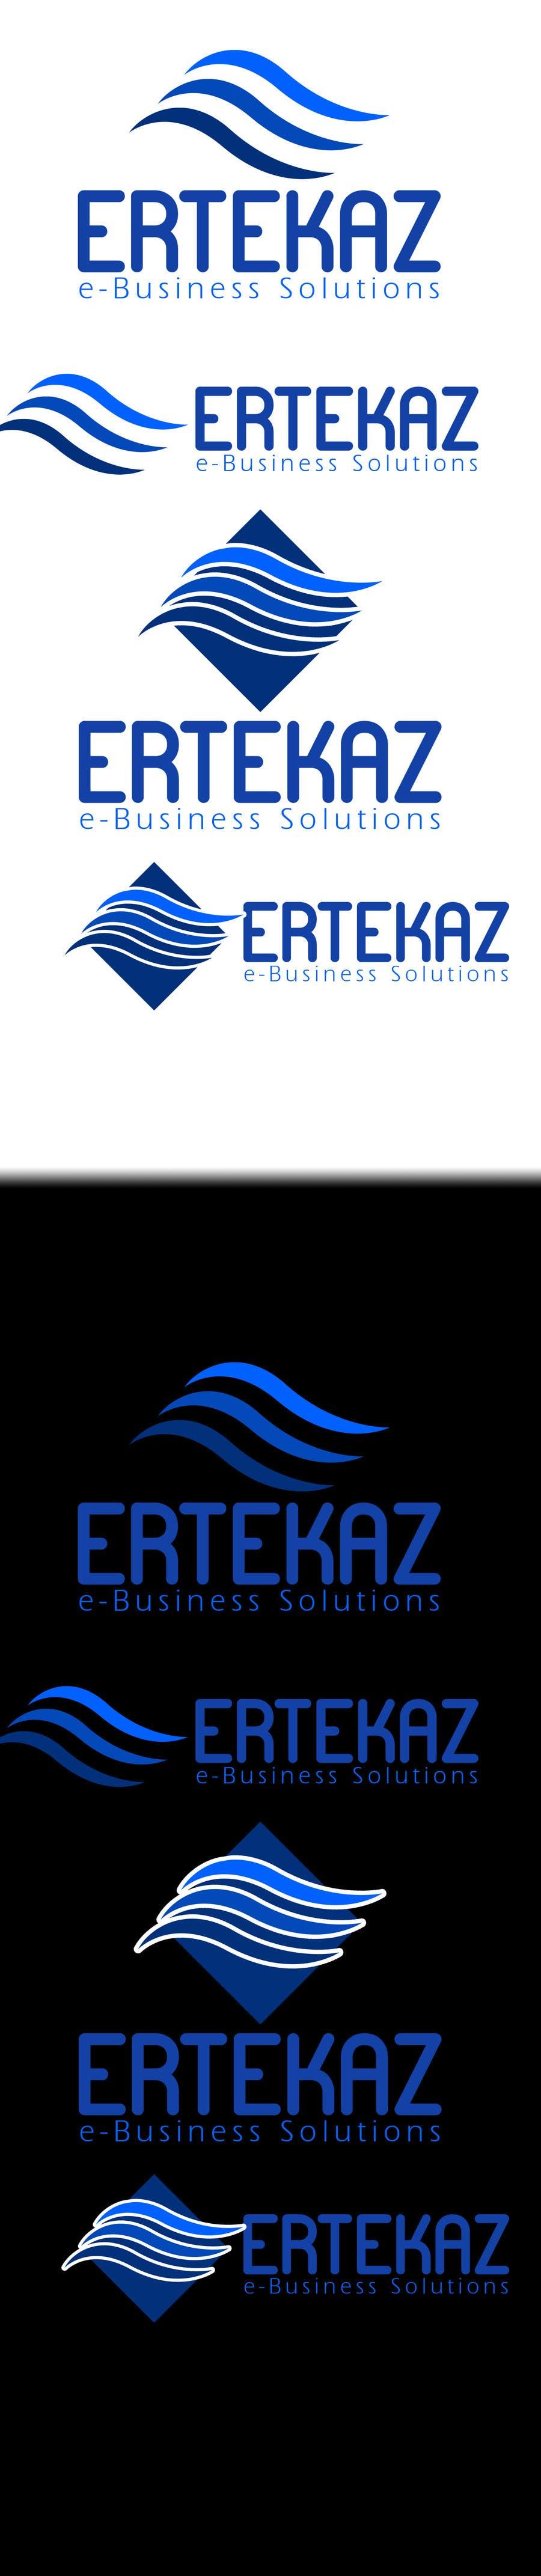 Kilpailutyö #192 kilpailussa Design a Logo for e-Business Company